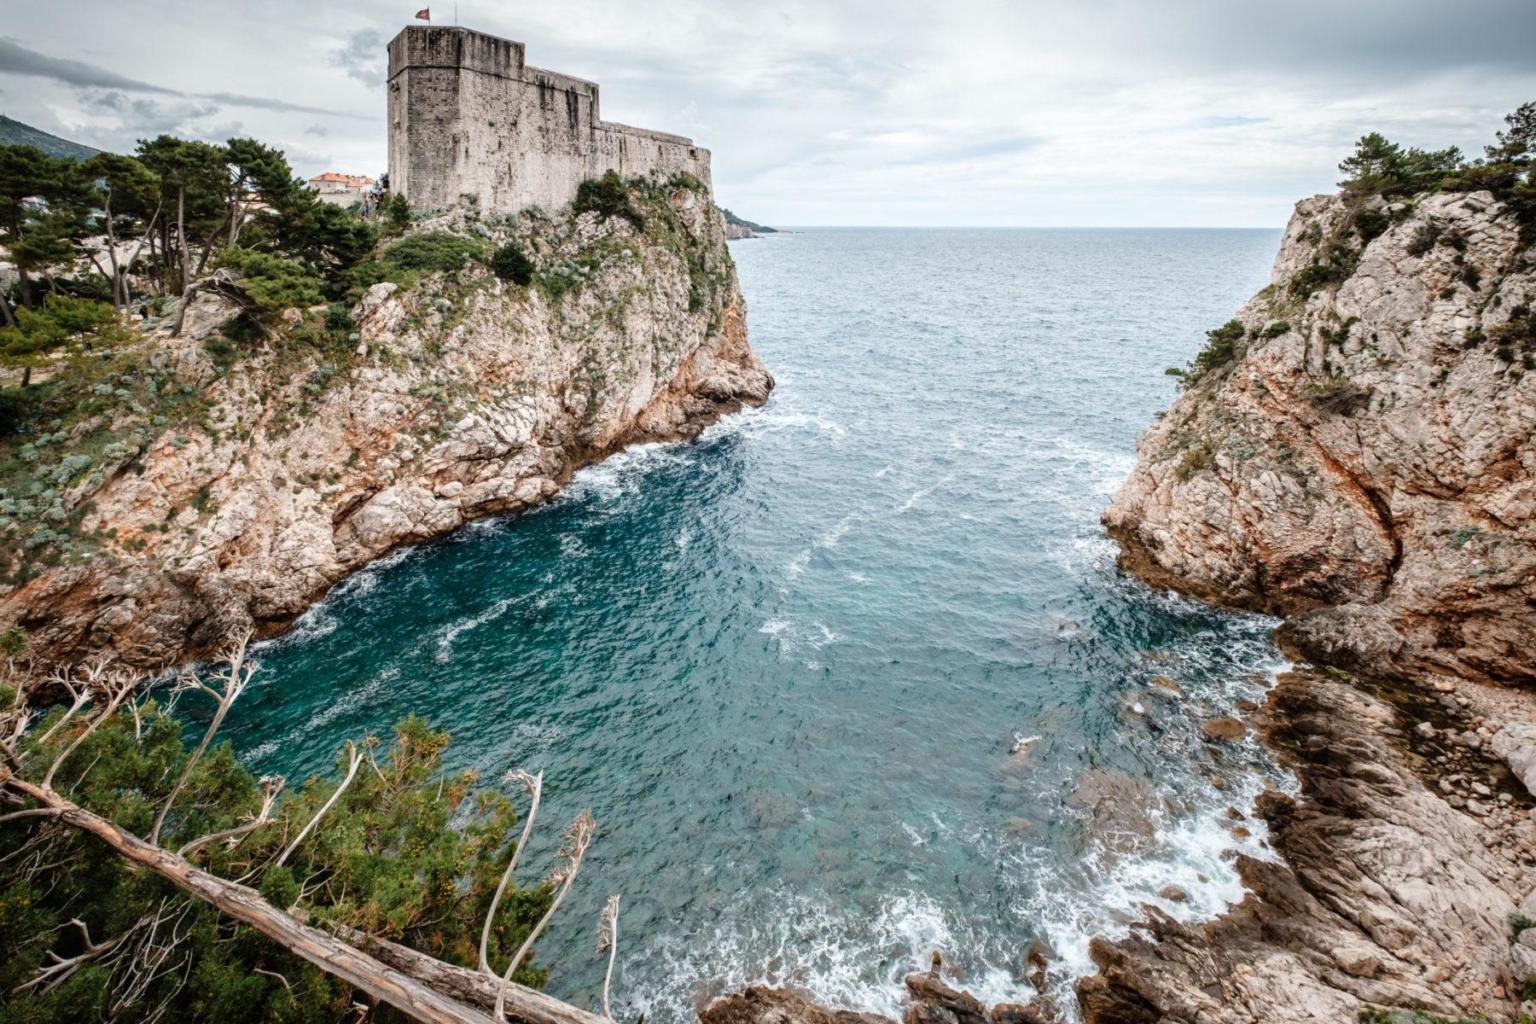 Ausblick auf historische Festung in Kroatien